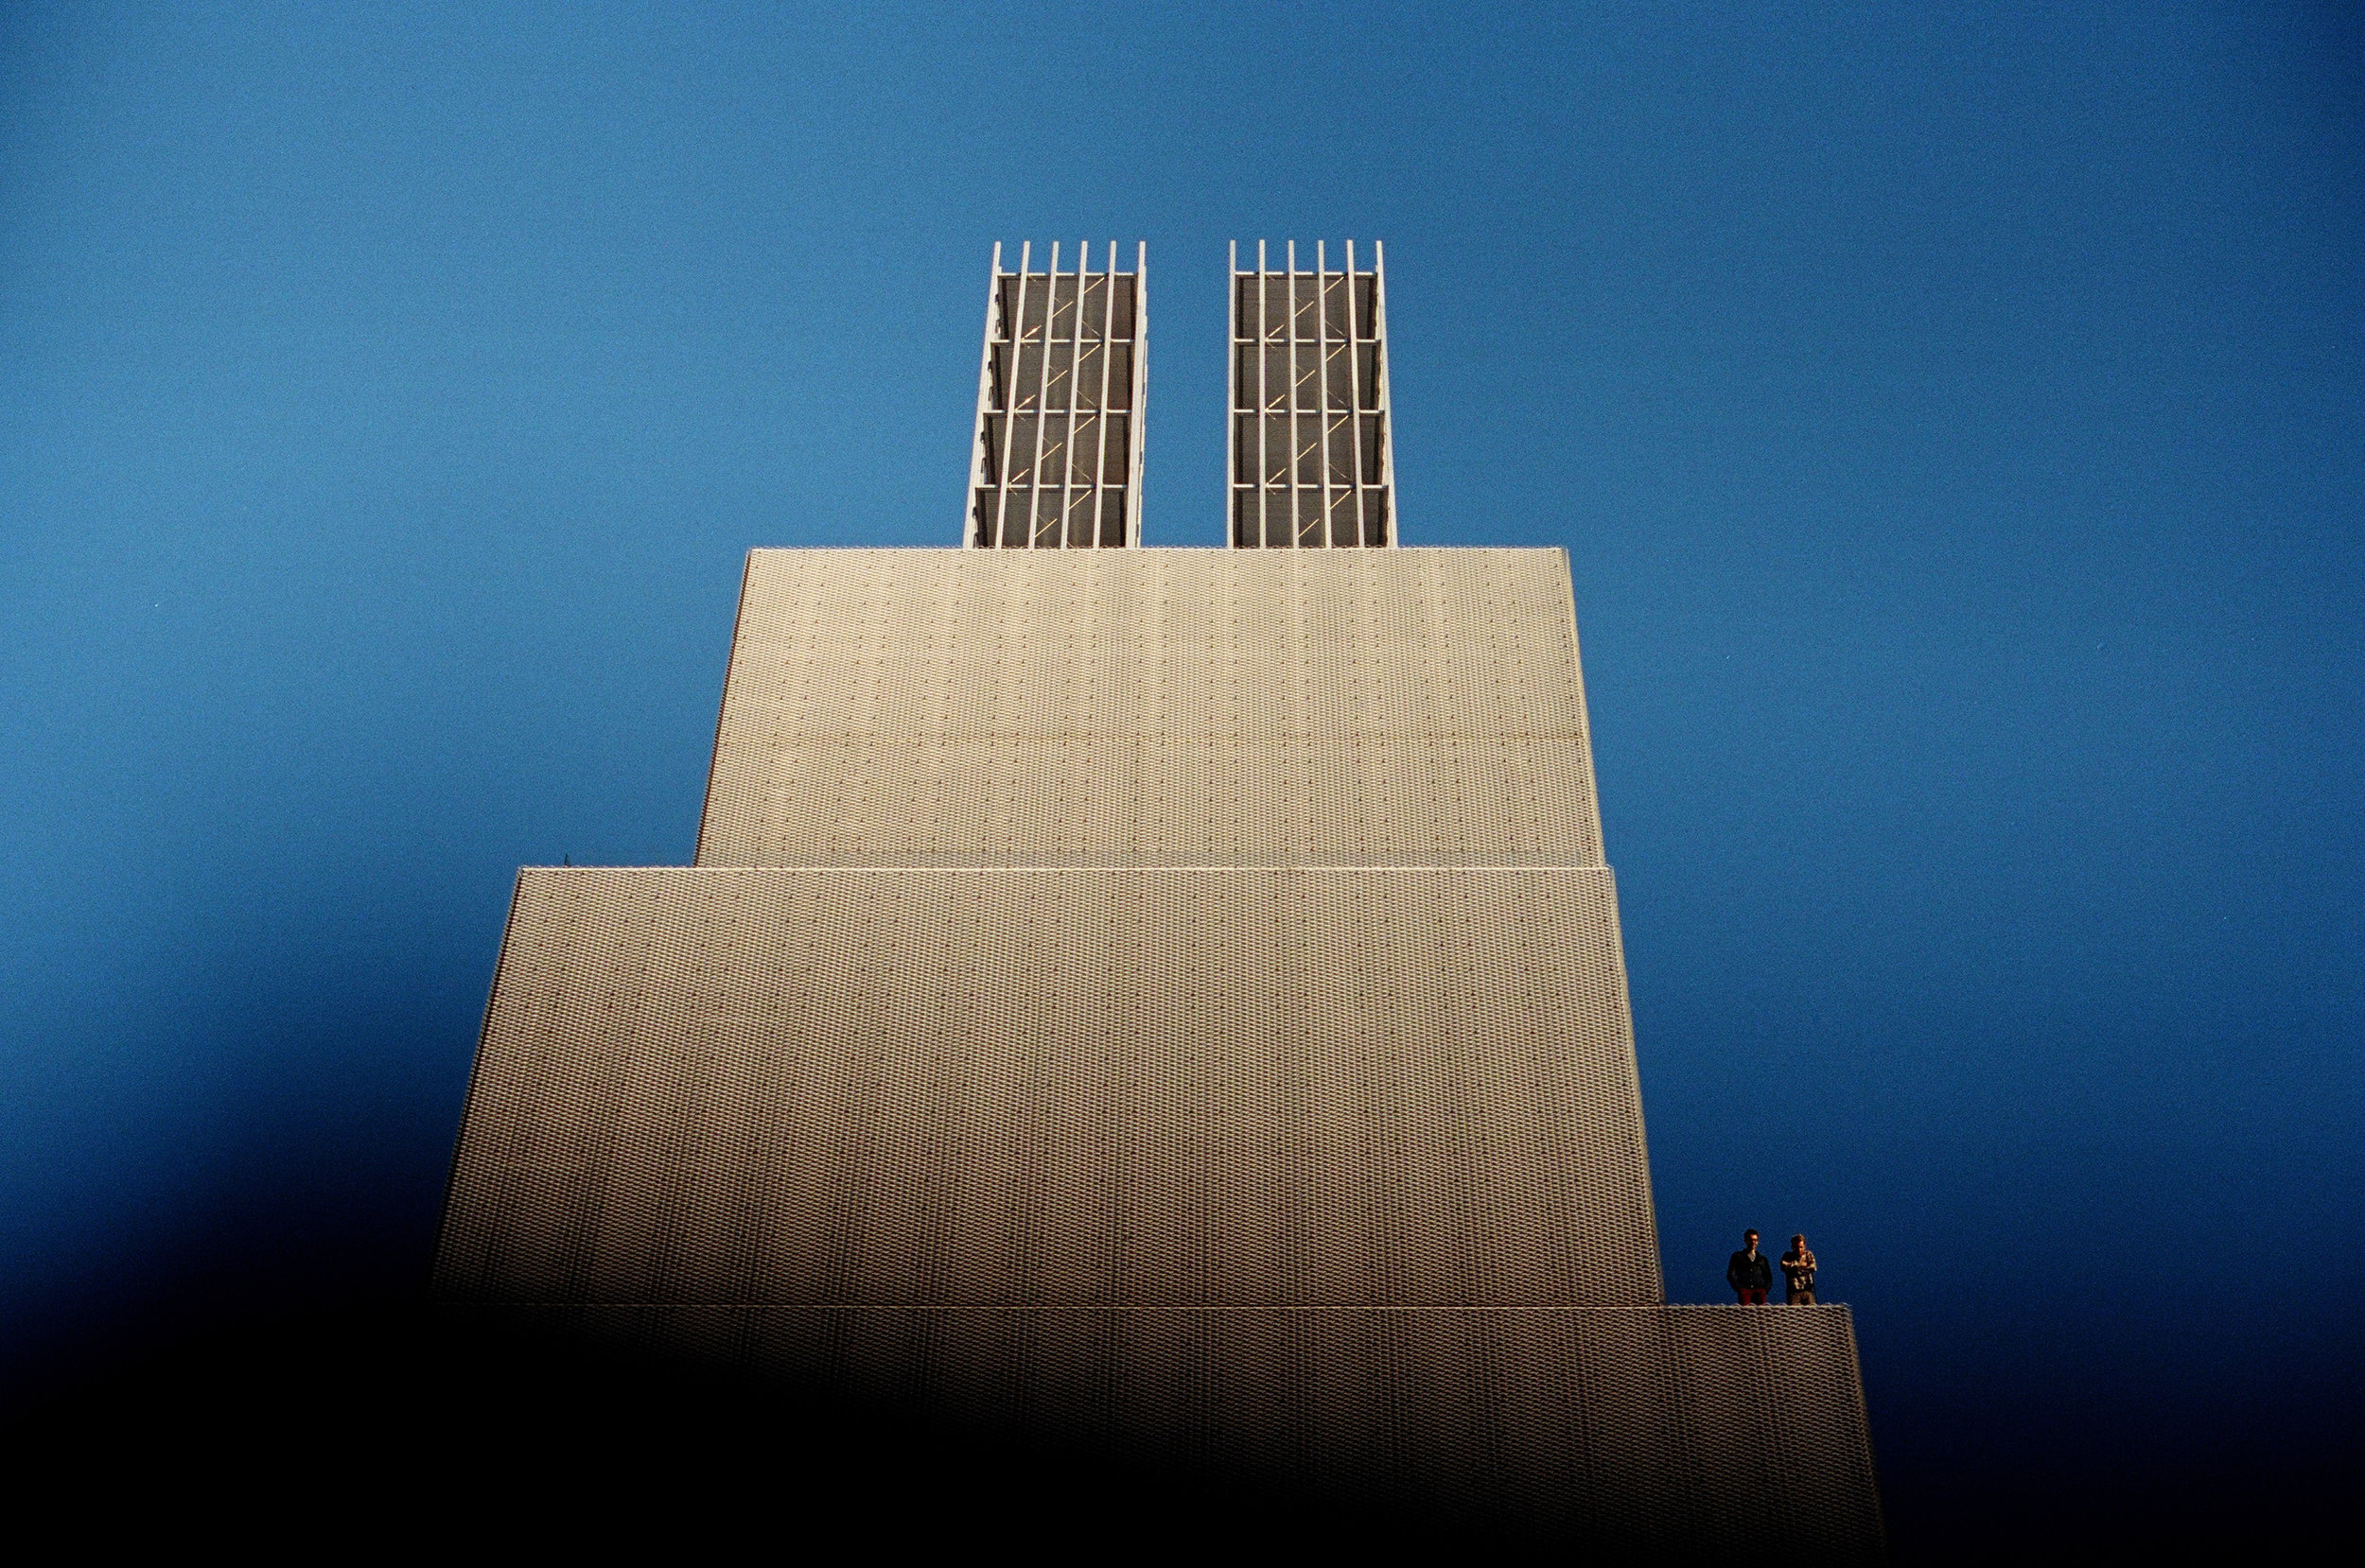 Blue | Nikon F3 | 50mm F/1.4 | Alex Linzmeier